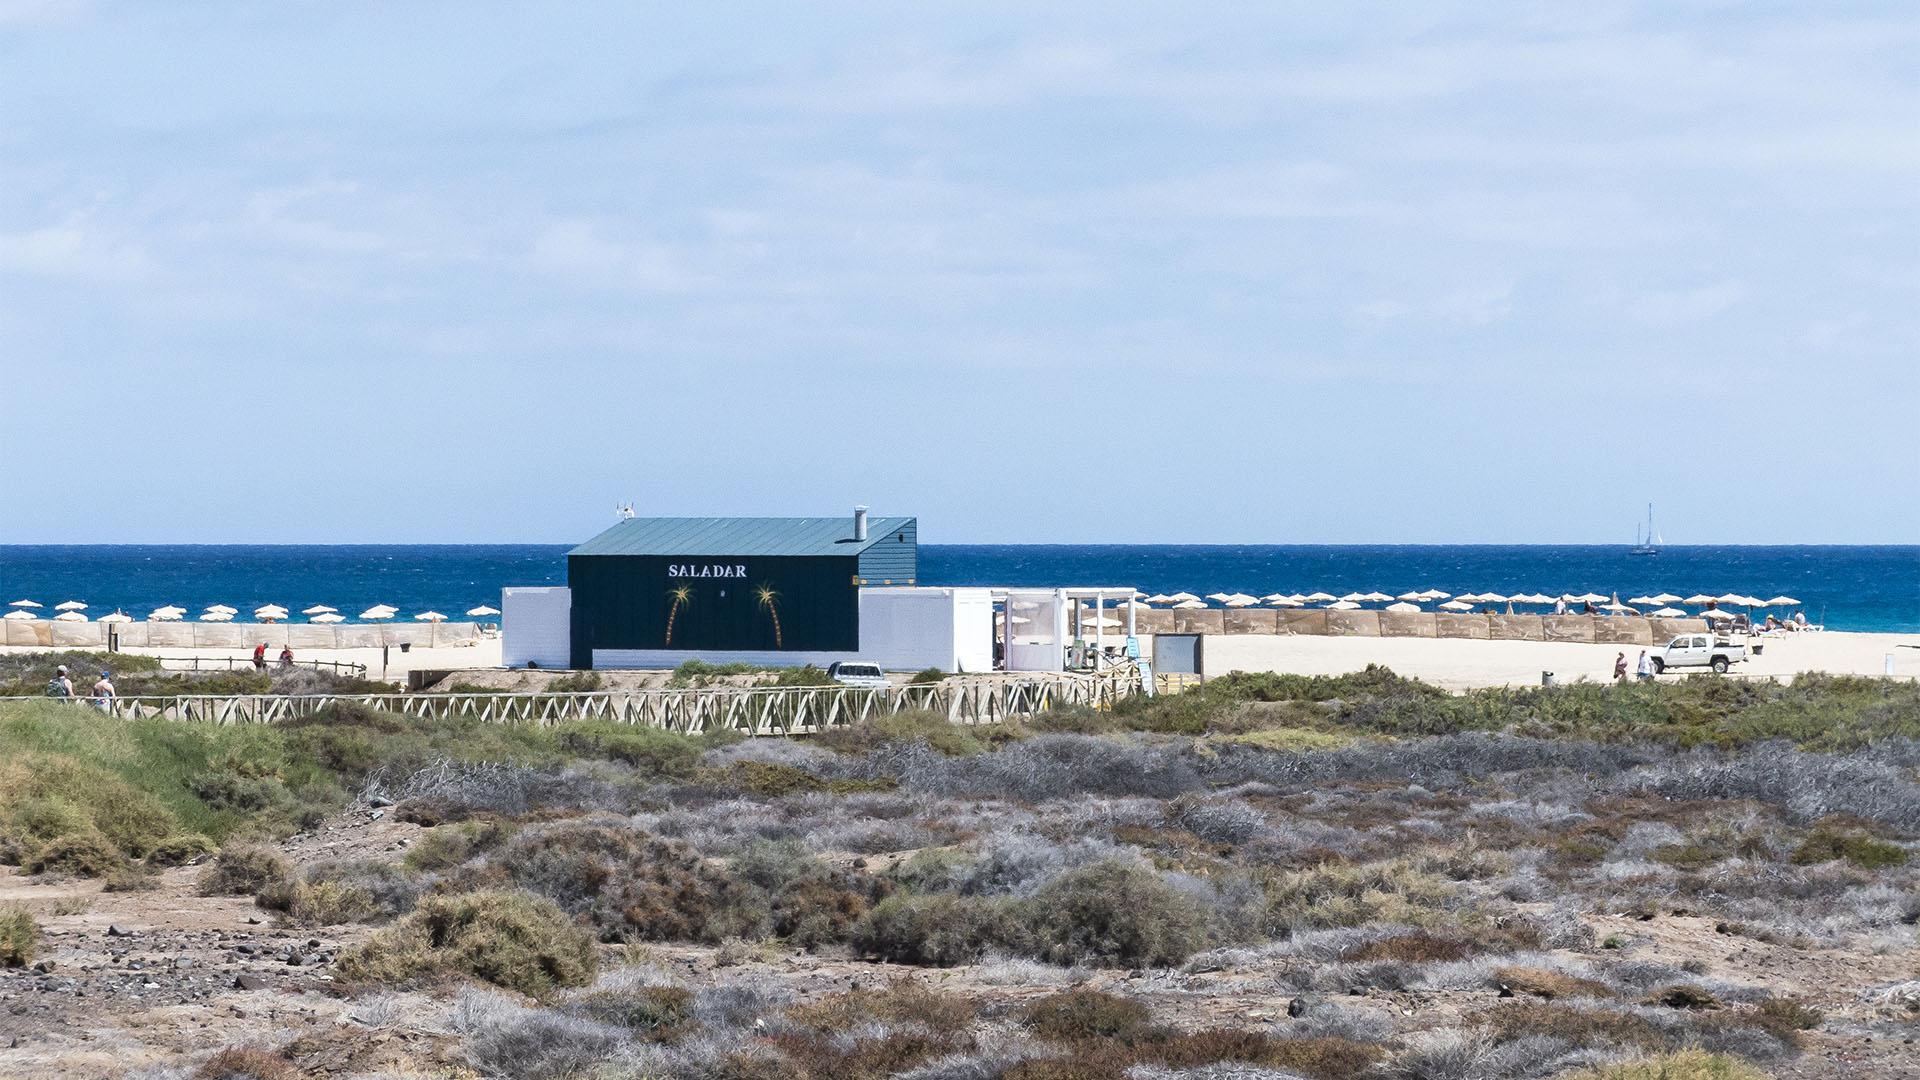 Die Strände Fuerteventuras: Halbinsel Jandía, Playa del Matorral.